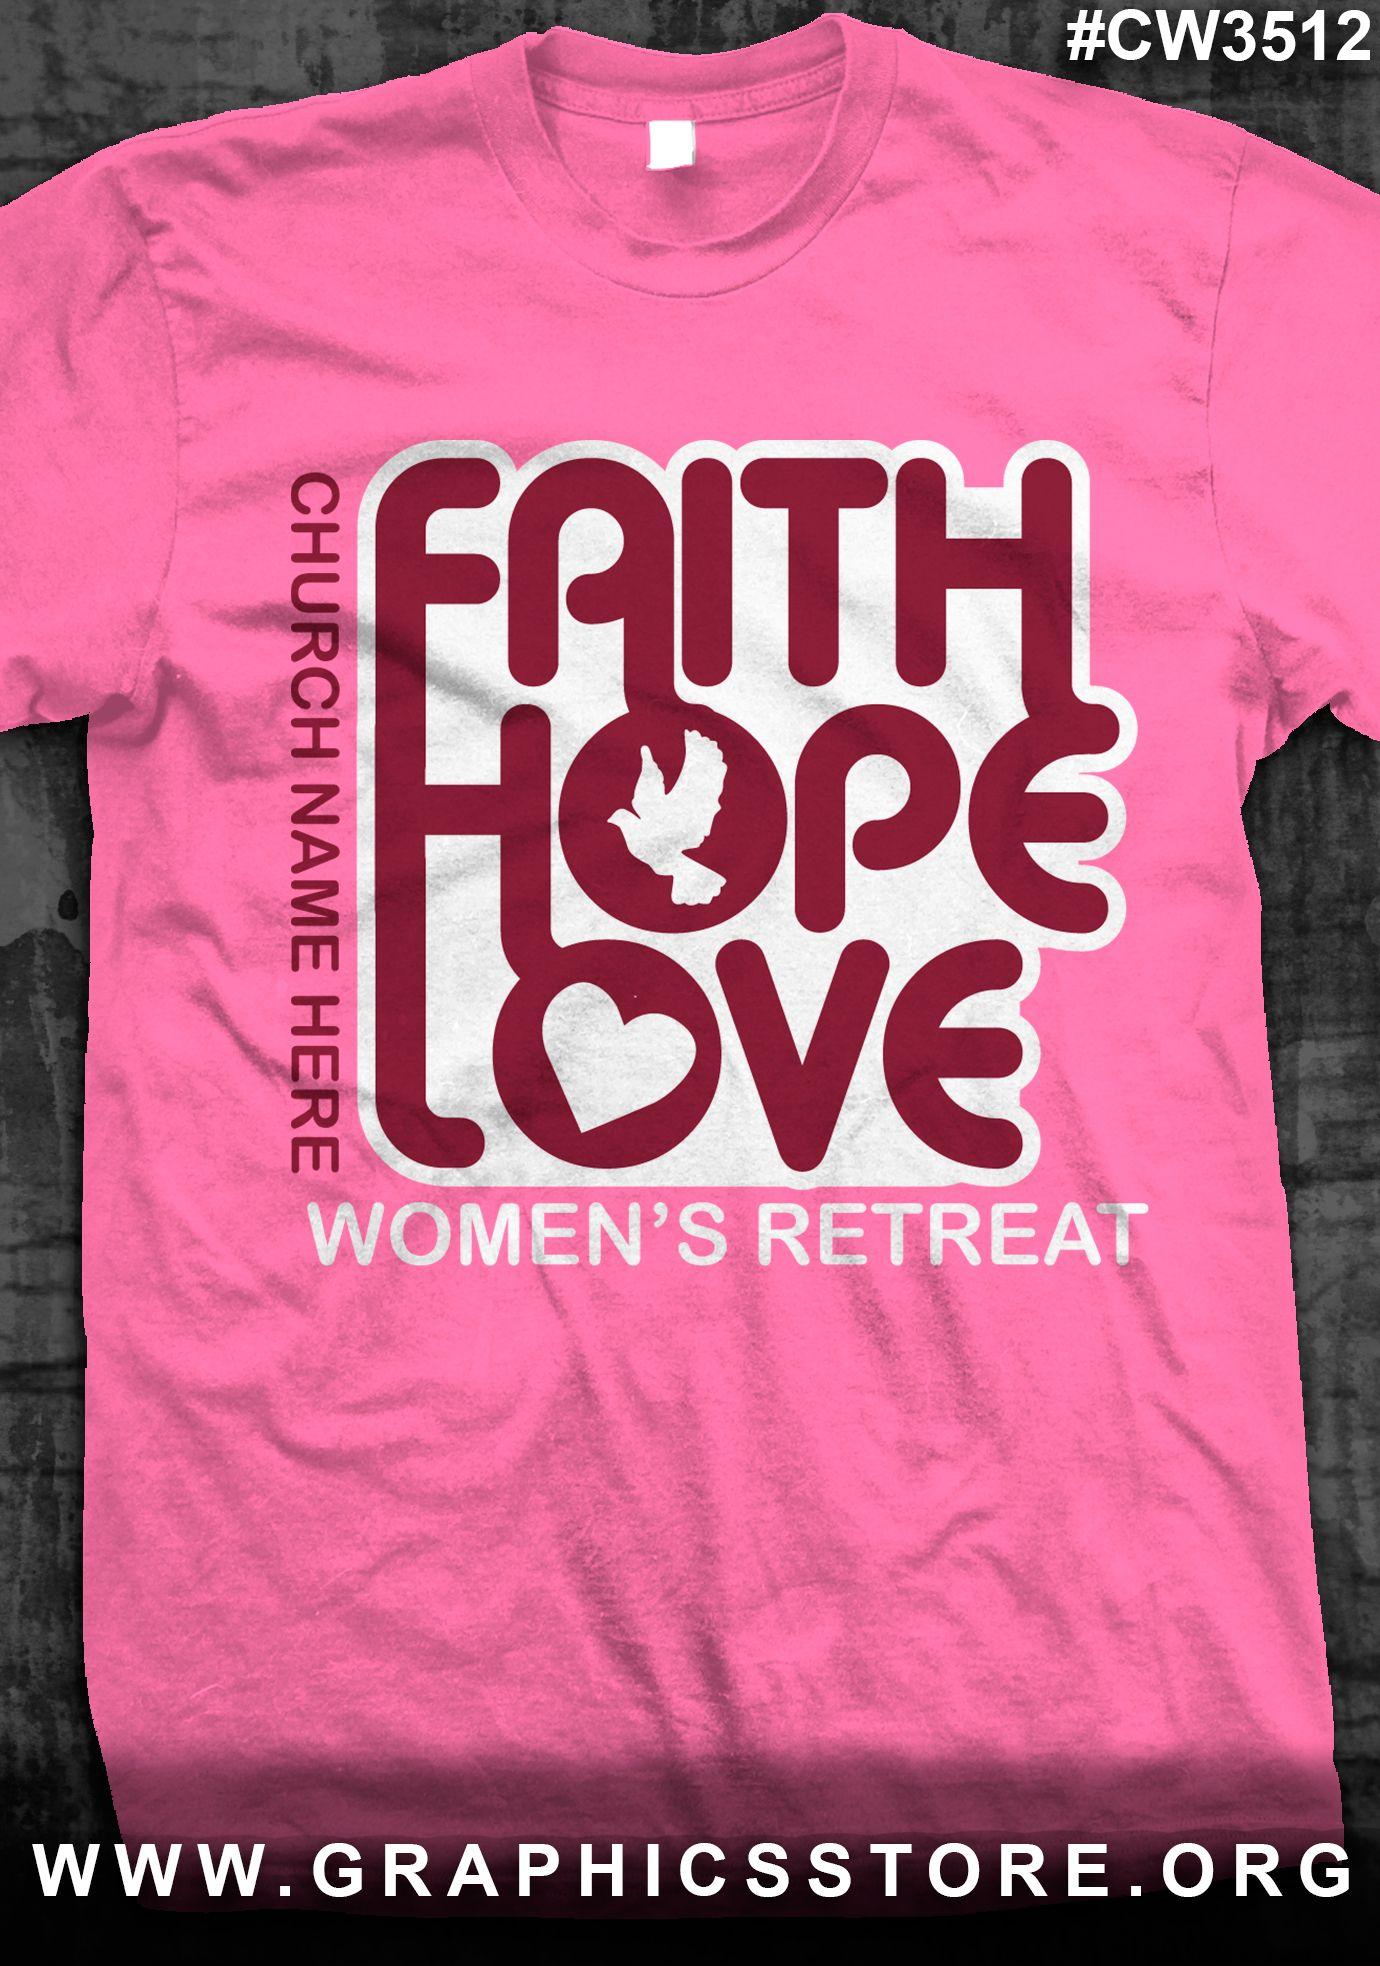 T shirt design richmond va -  Cw3512 Women S Ministry T Shirts